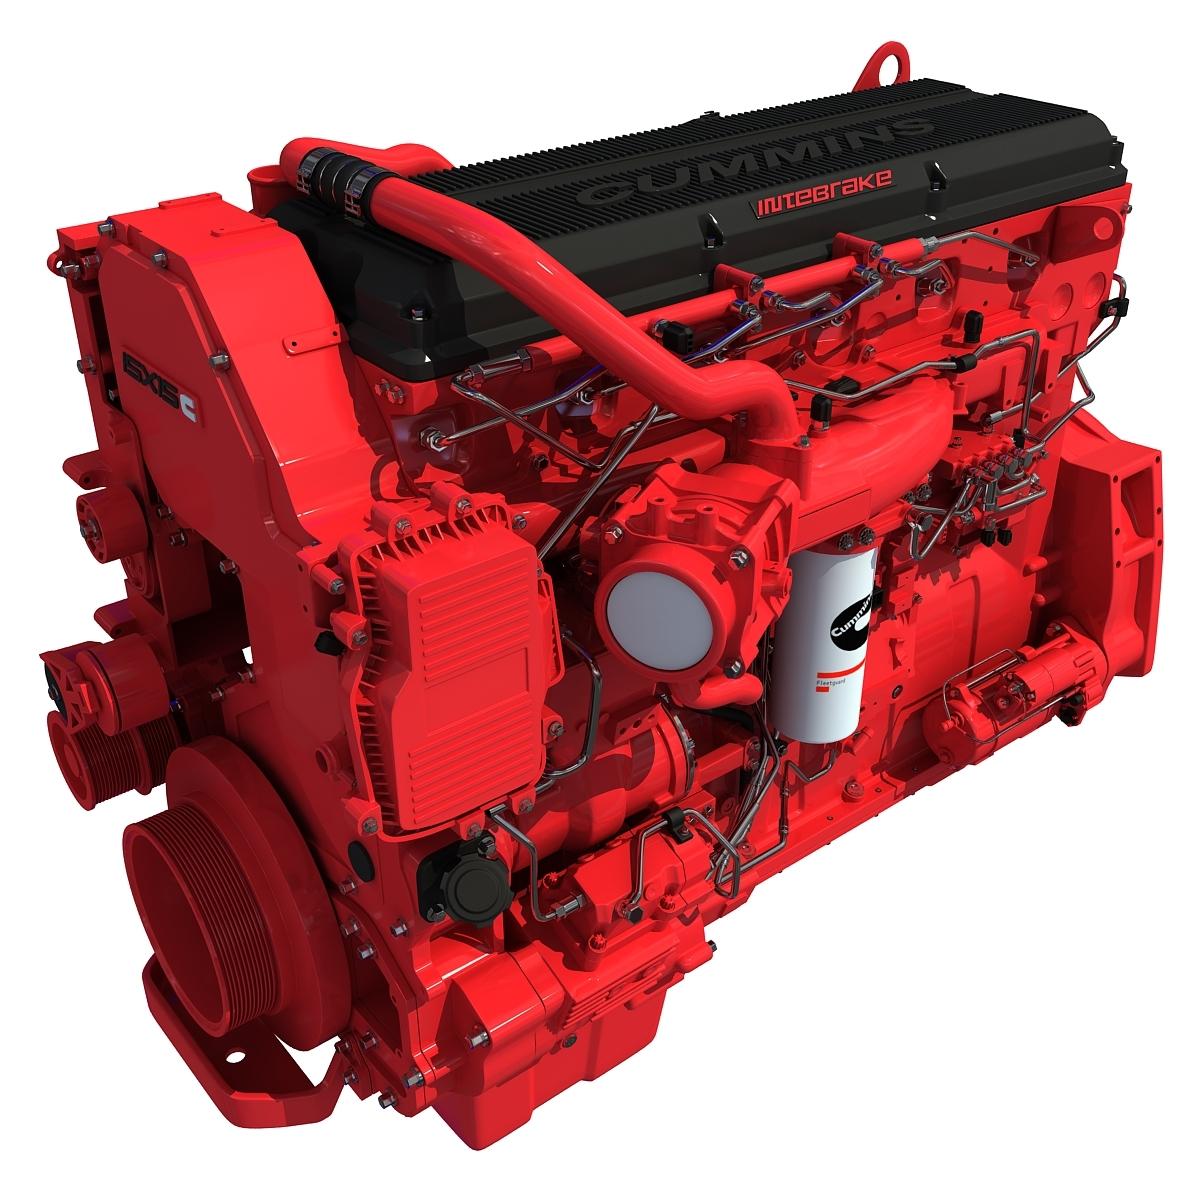 Cummins Diesel Engines >> Heavy Duty Diesel Engine Isx15 Cummins